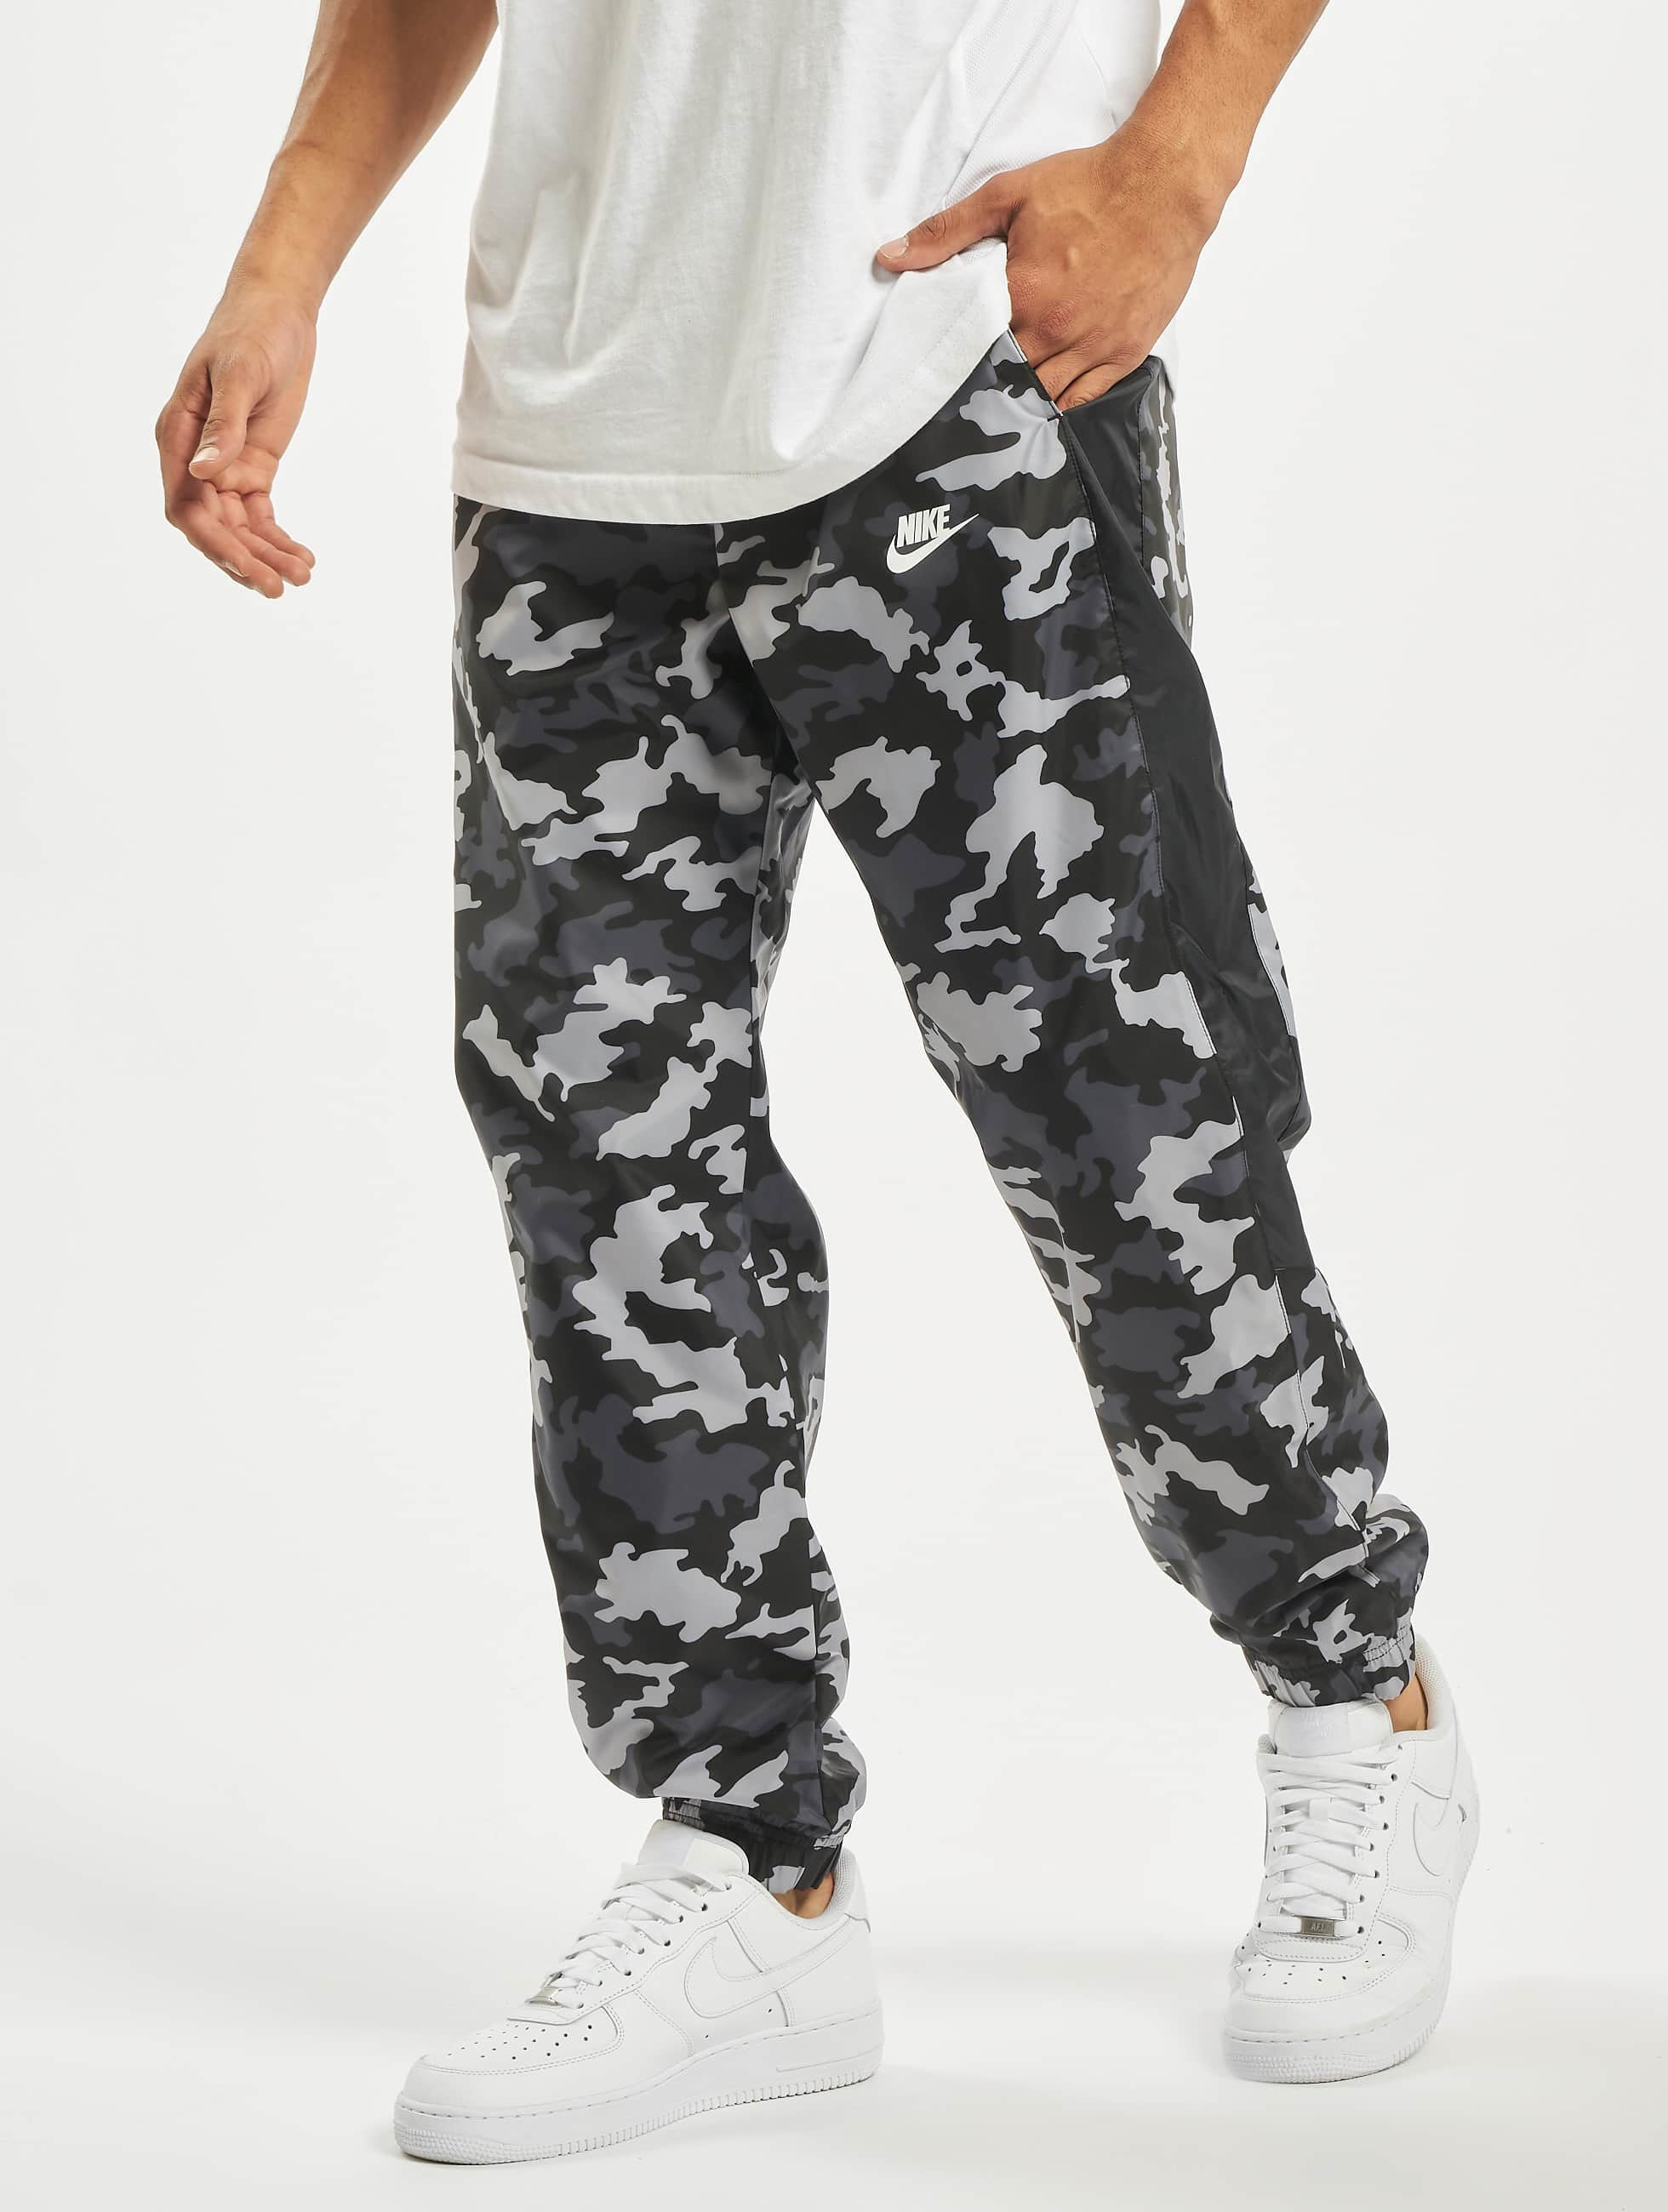 Nike CE CF Woven Camo Sweat Pants BlackBlackSummit White